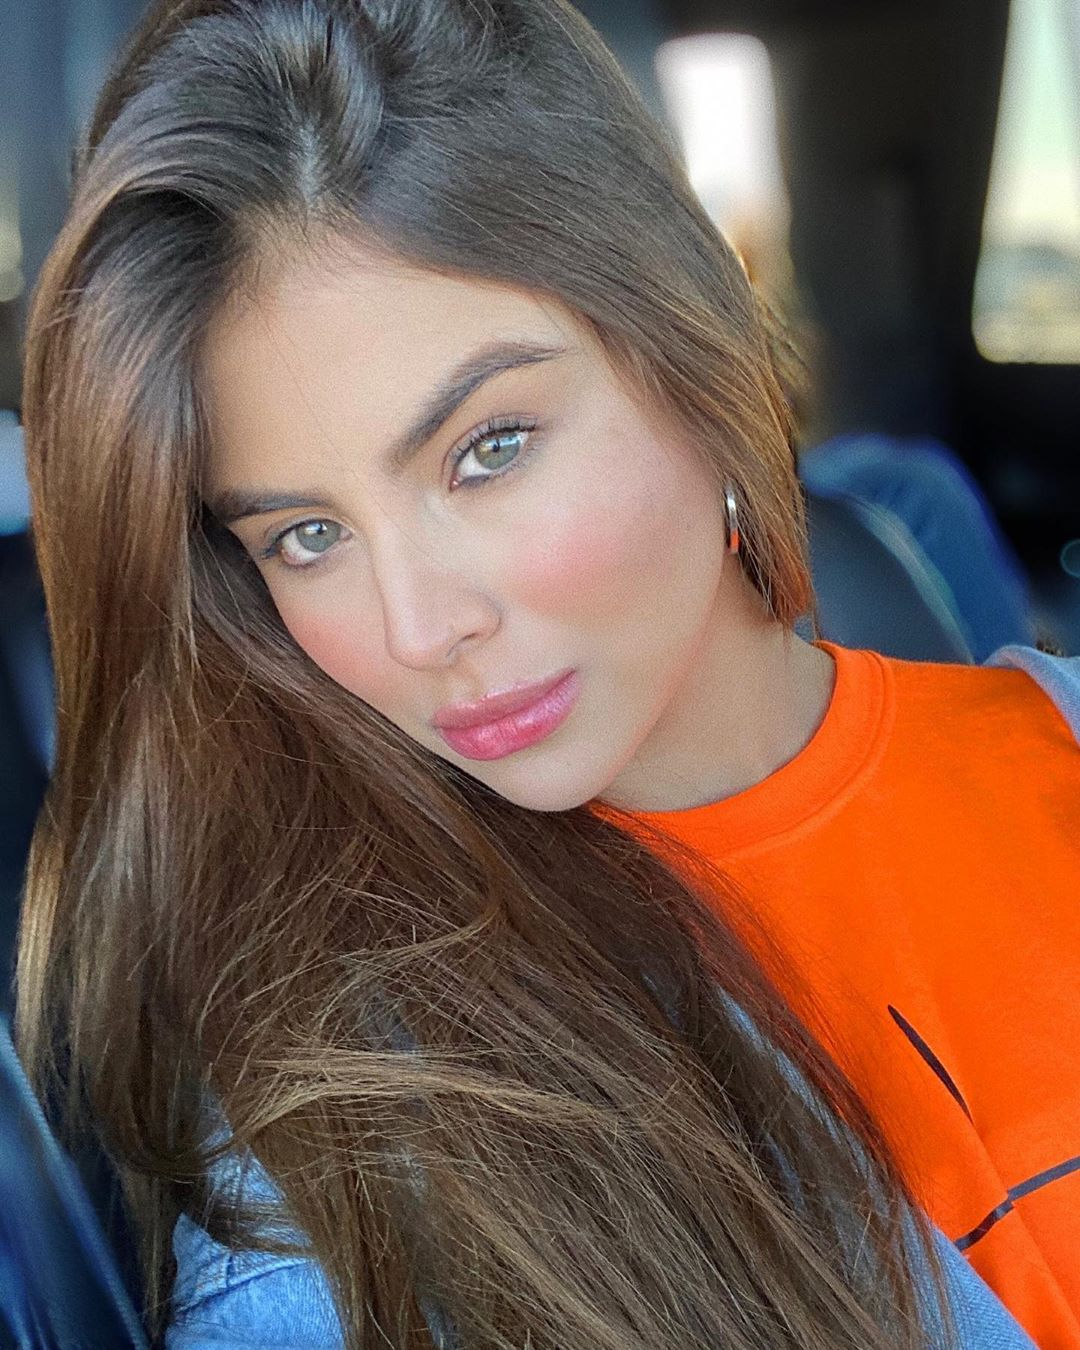 Laura-Sanchez-H-Wallpapers-Insta-Fit-Bio-1